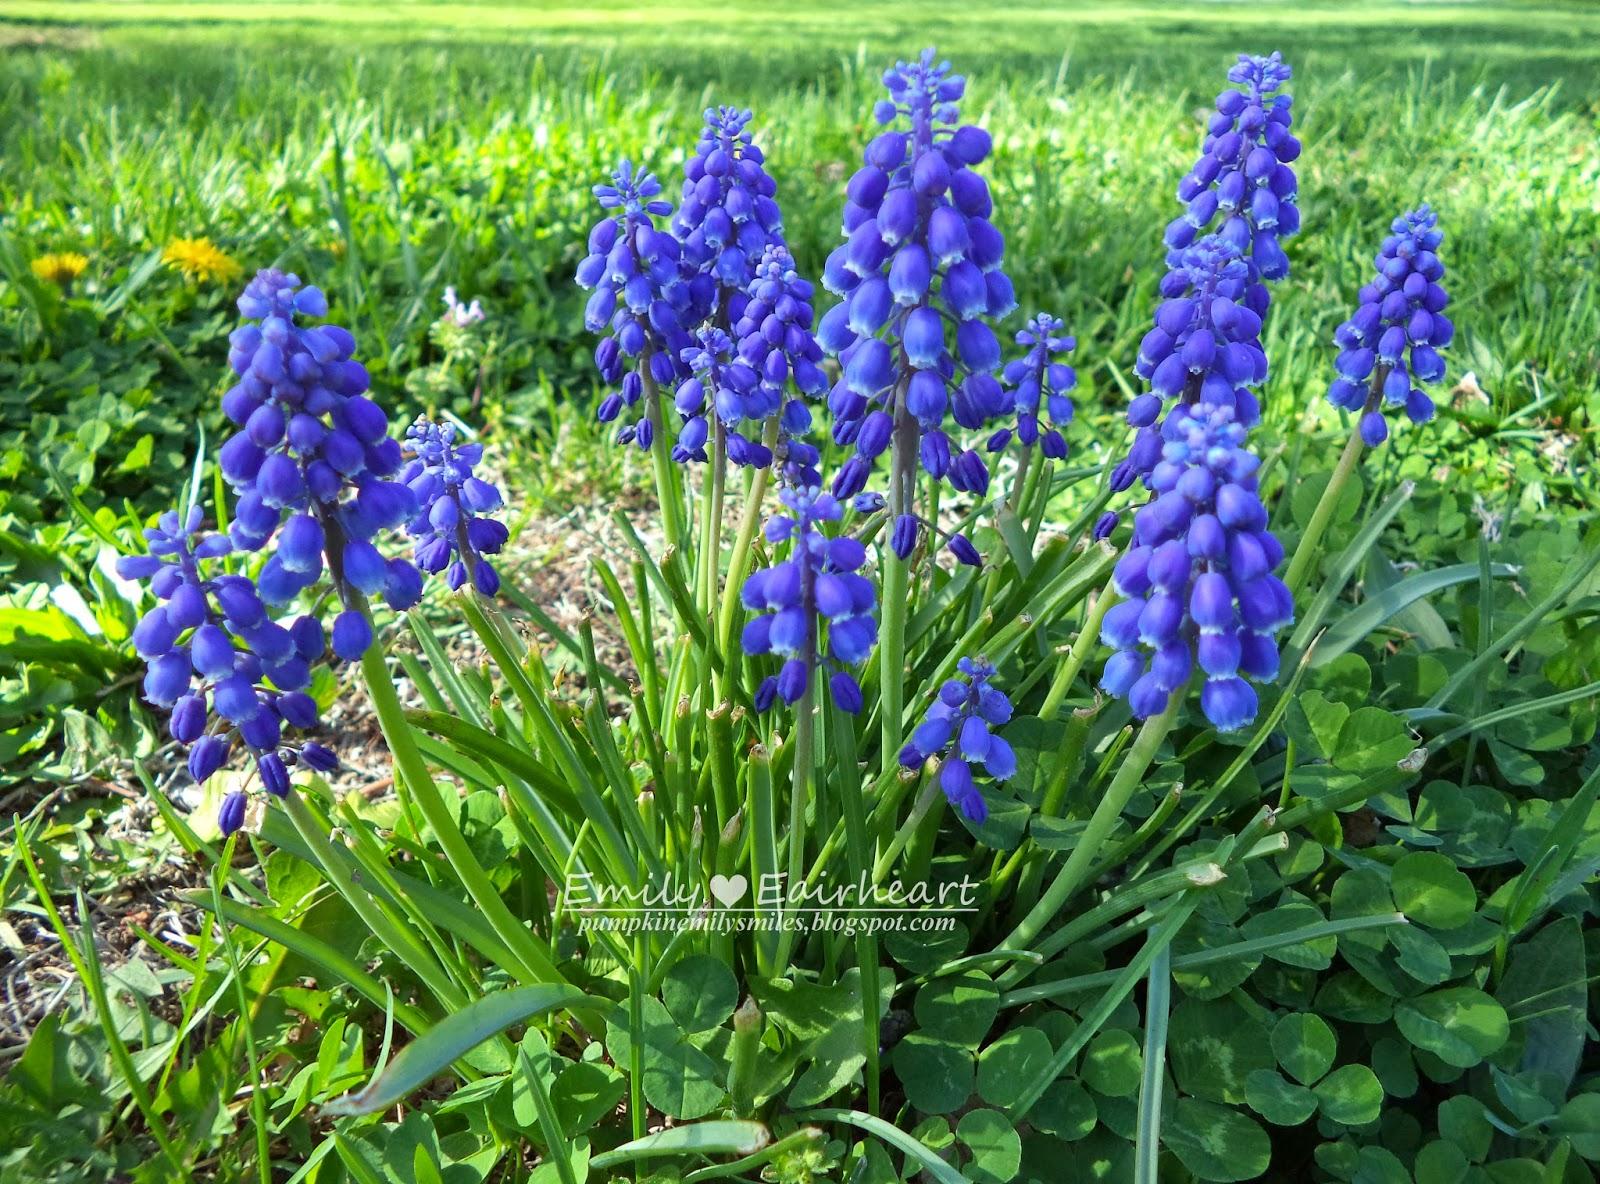 A group of Grape Hyacinths